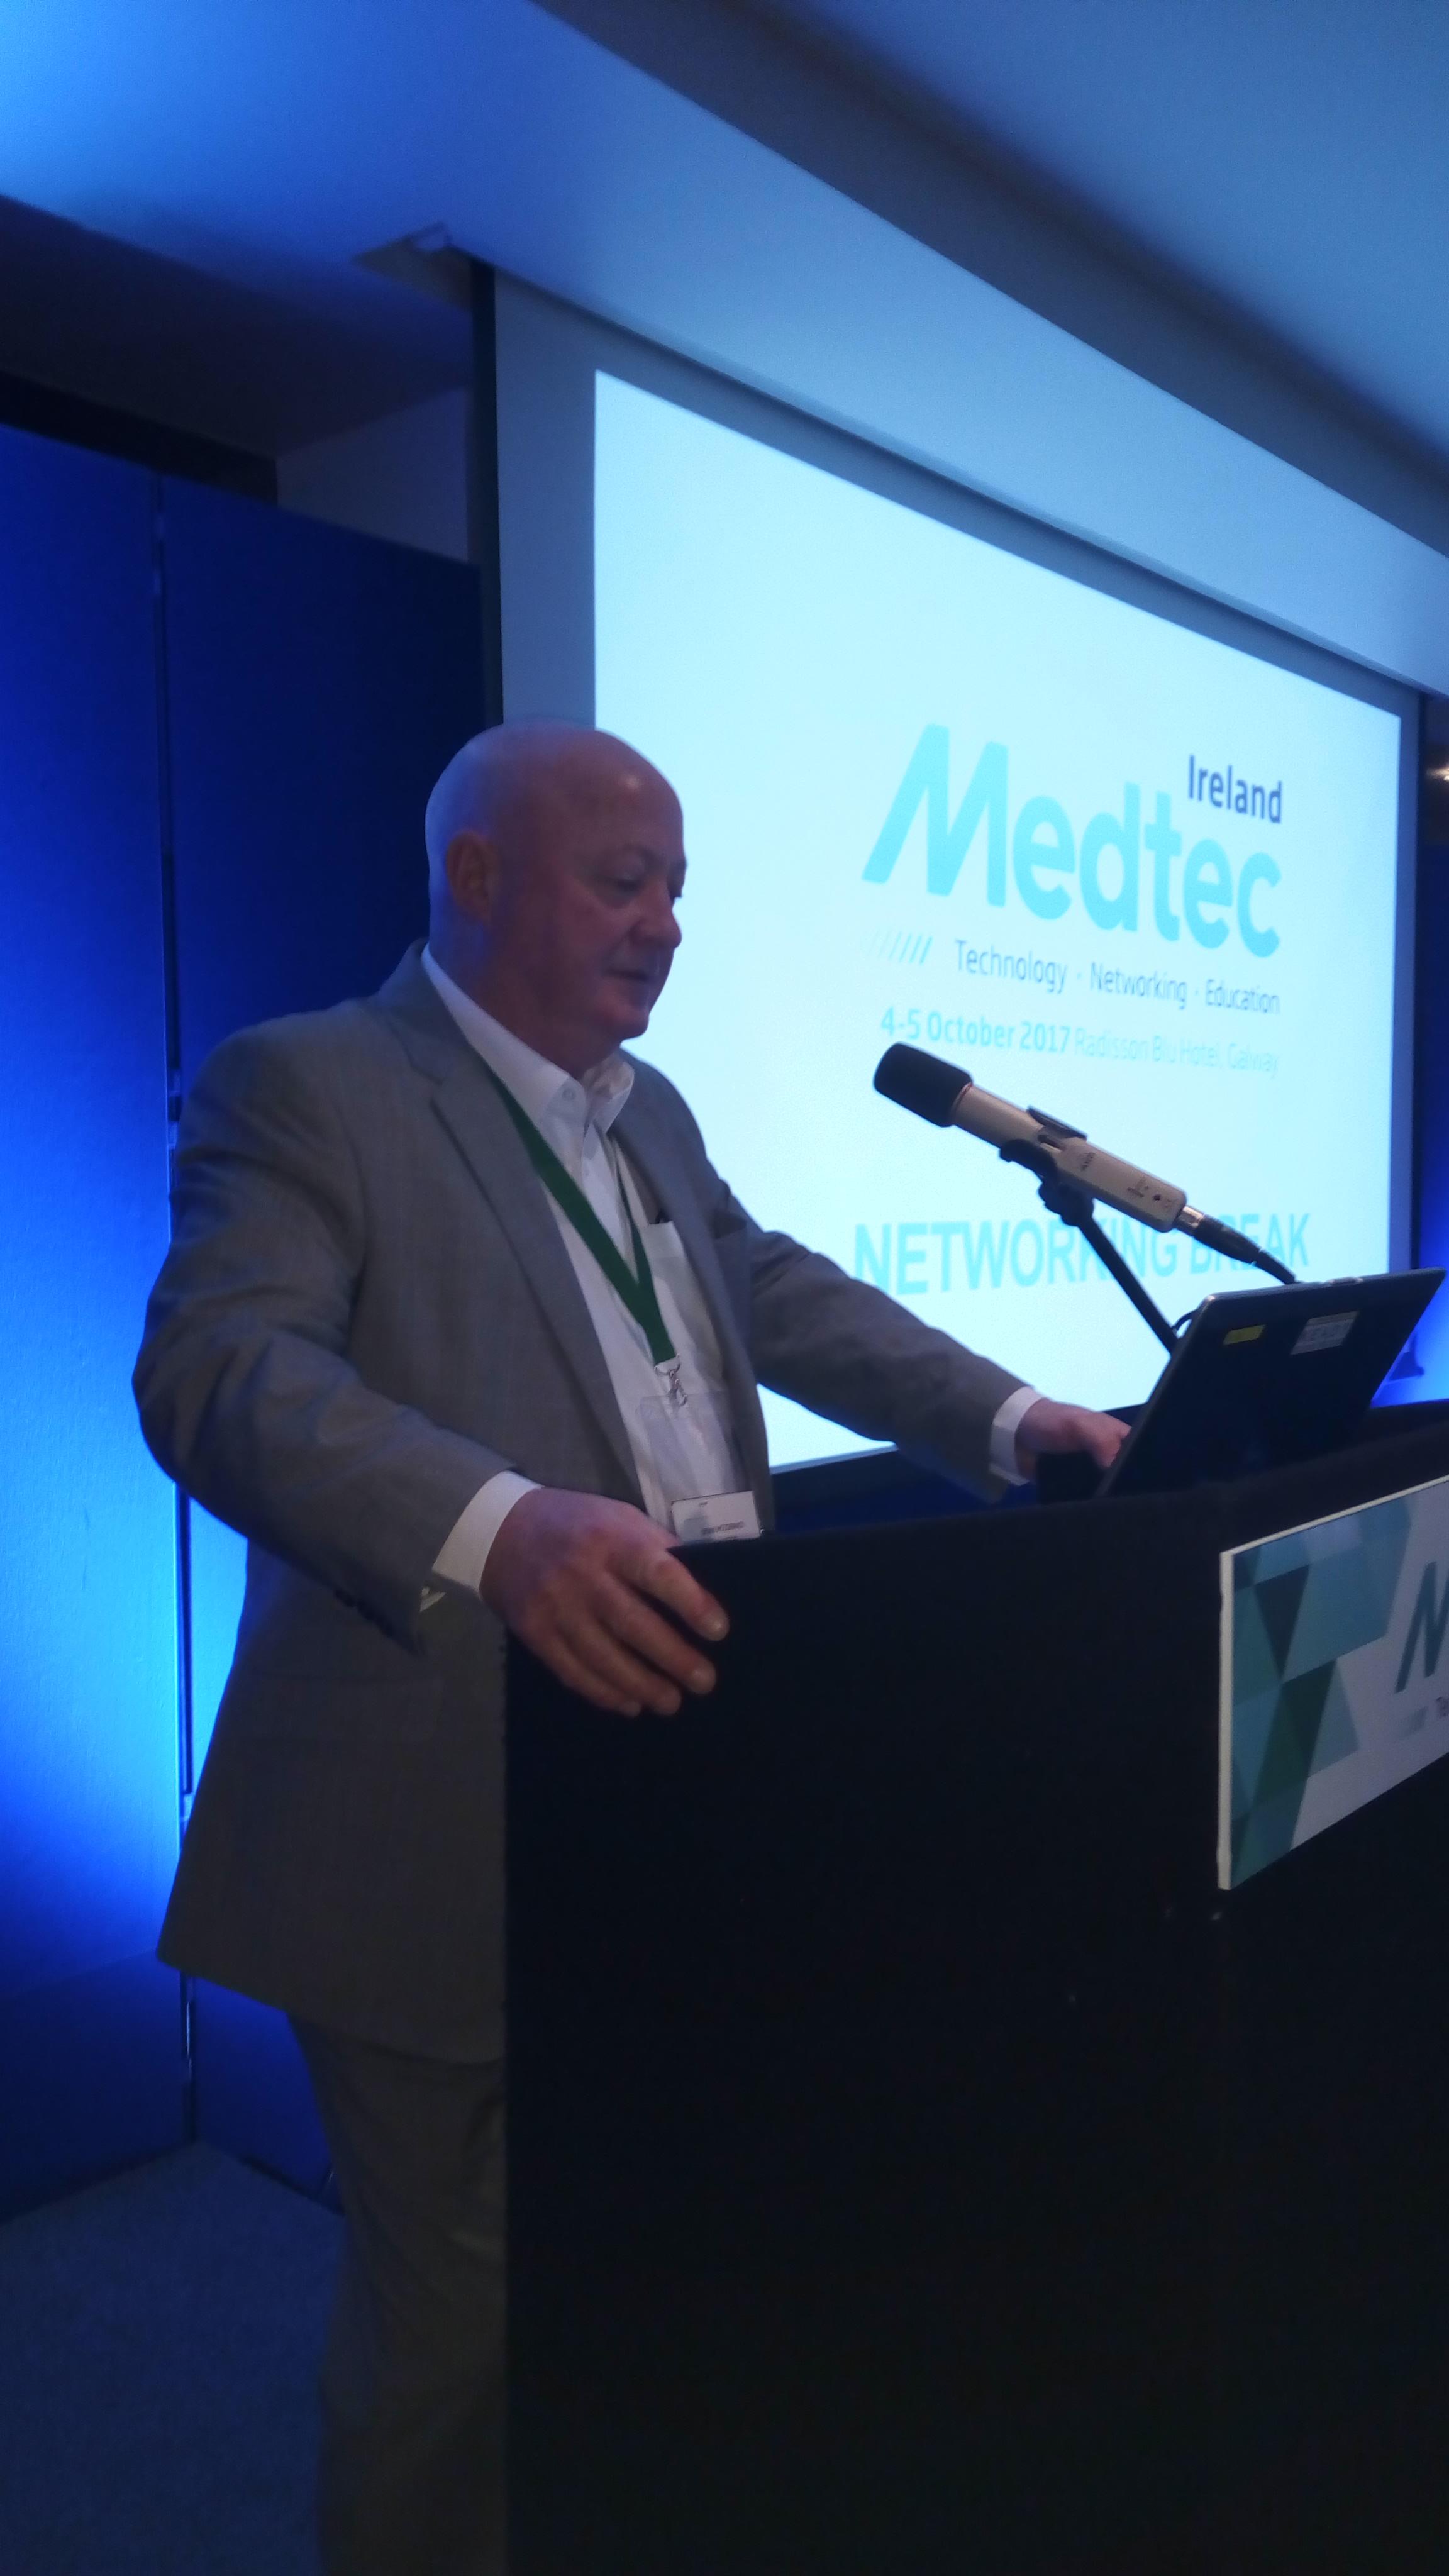 Brian prepares for a presentation at Medtec in Ireland.